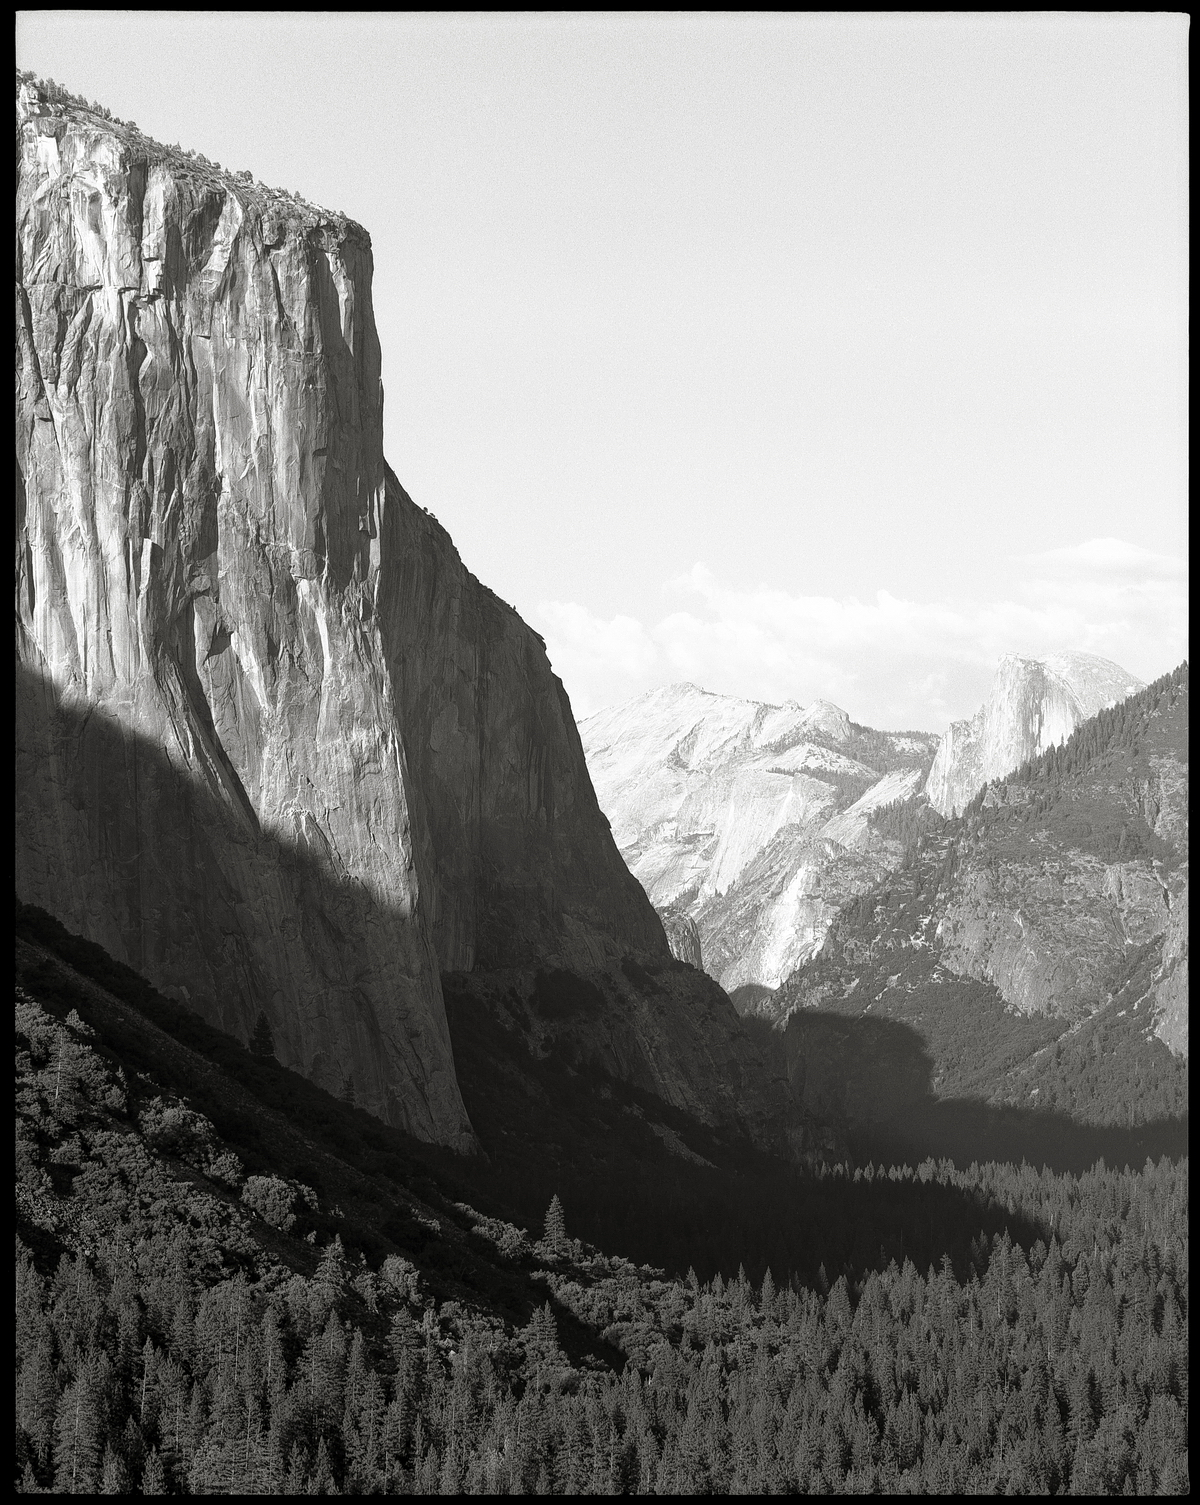 El Capitan 2012_Pentax 67_Kodak TMAX 100-sm